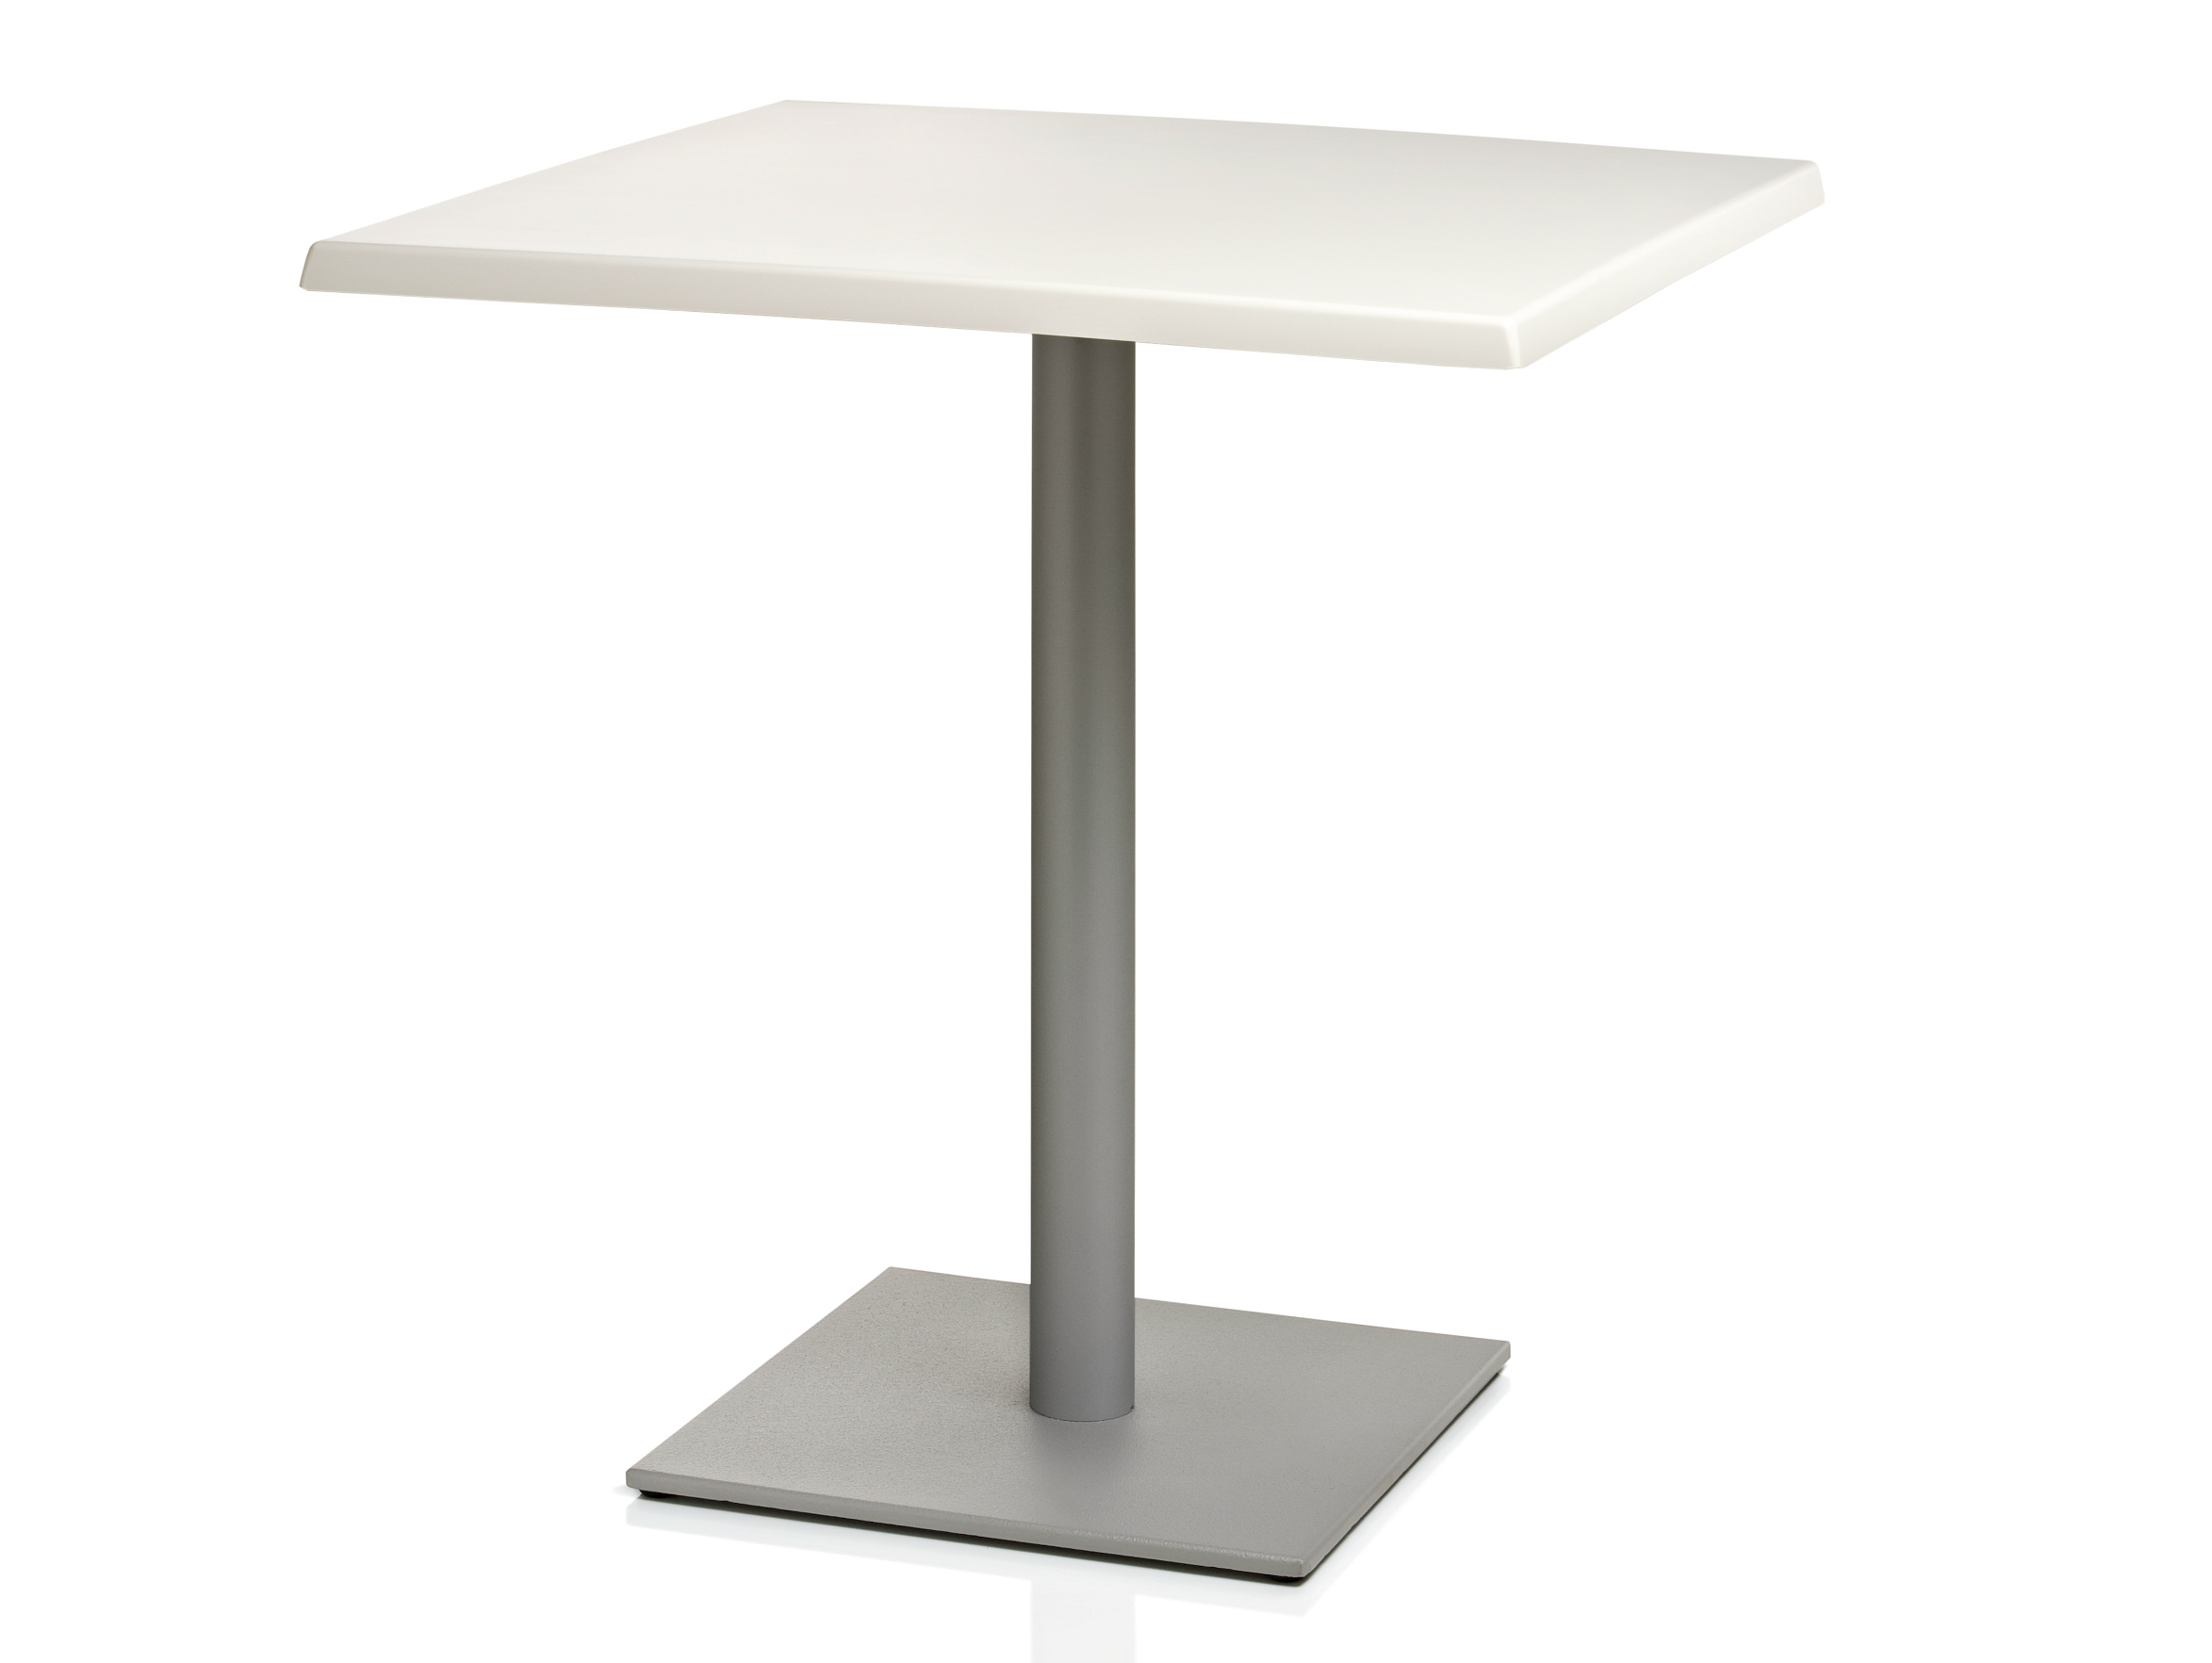 Square restaurant tables - Square Laminate Table